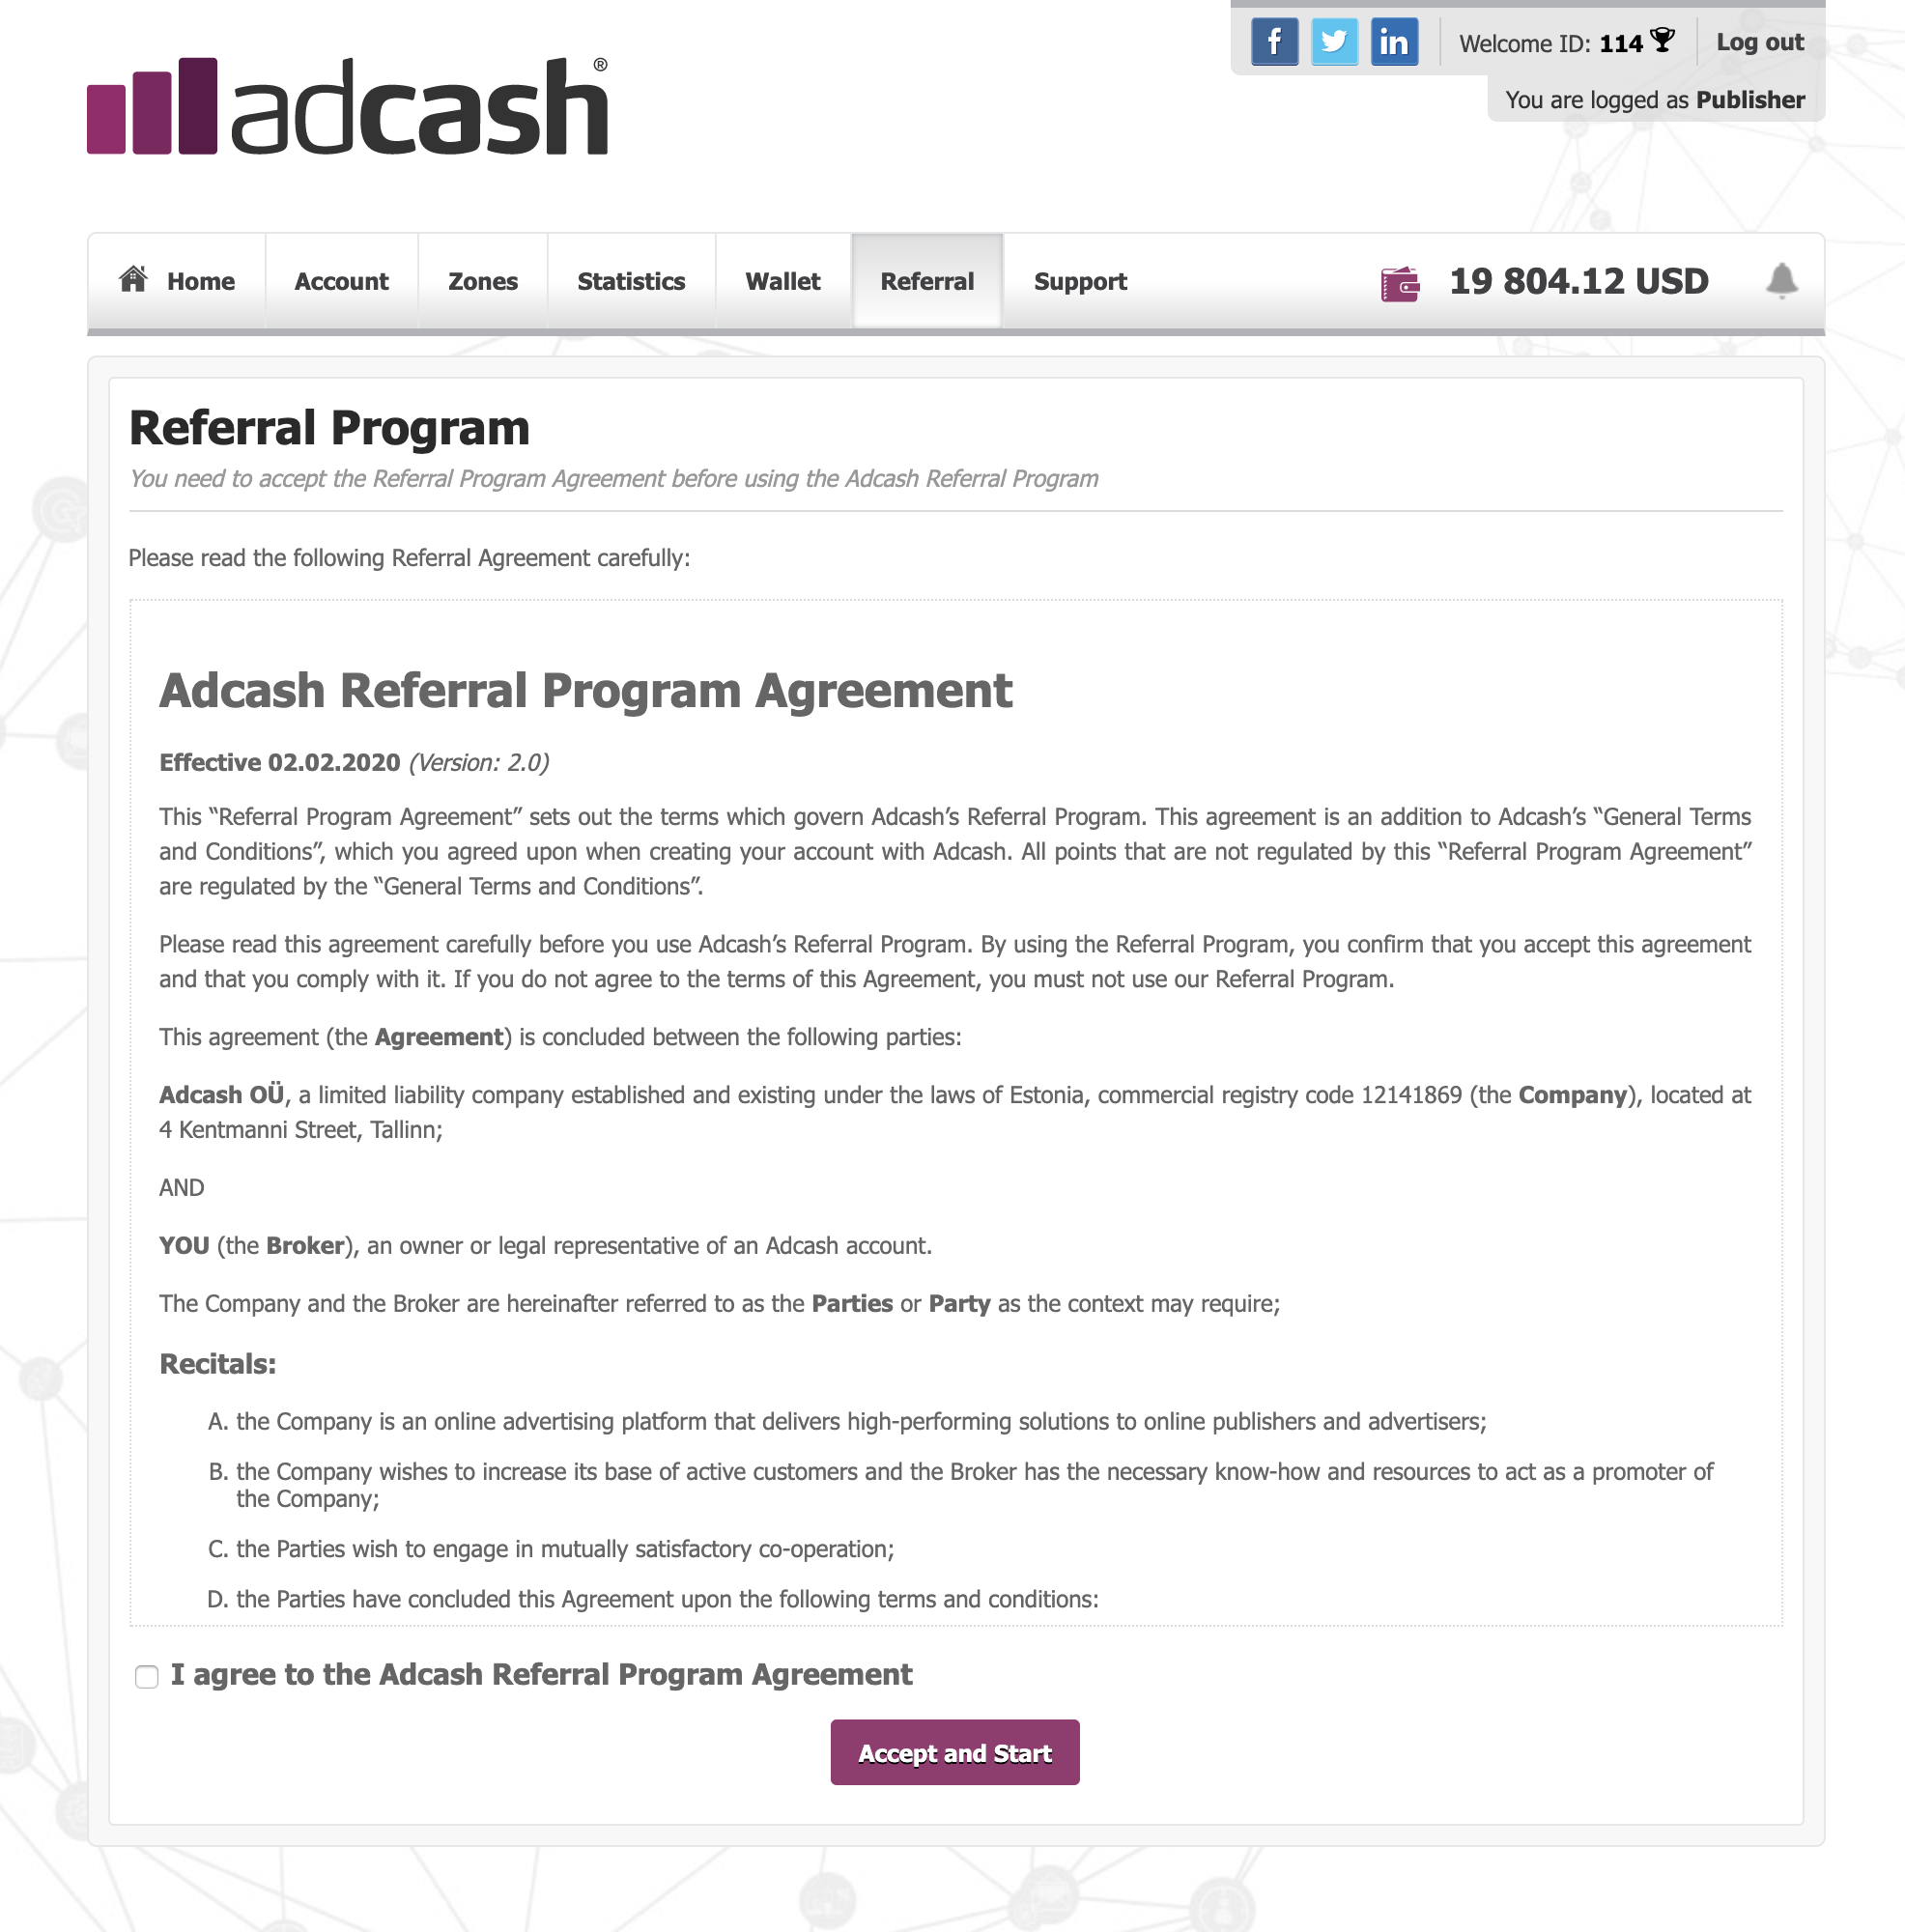 Easy Tricks on How to Make More Money Using AdCash Referral Program